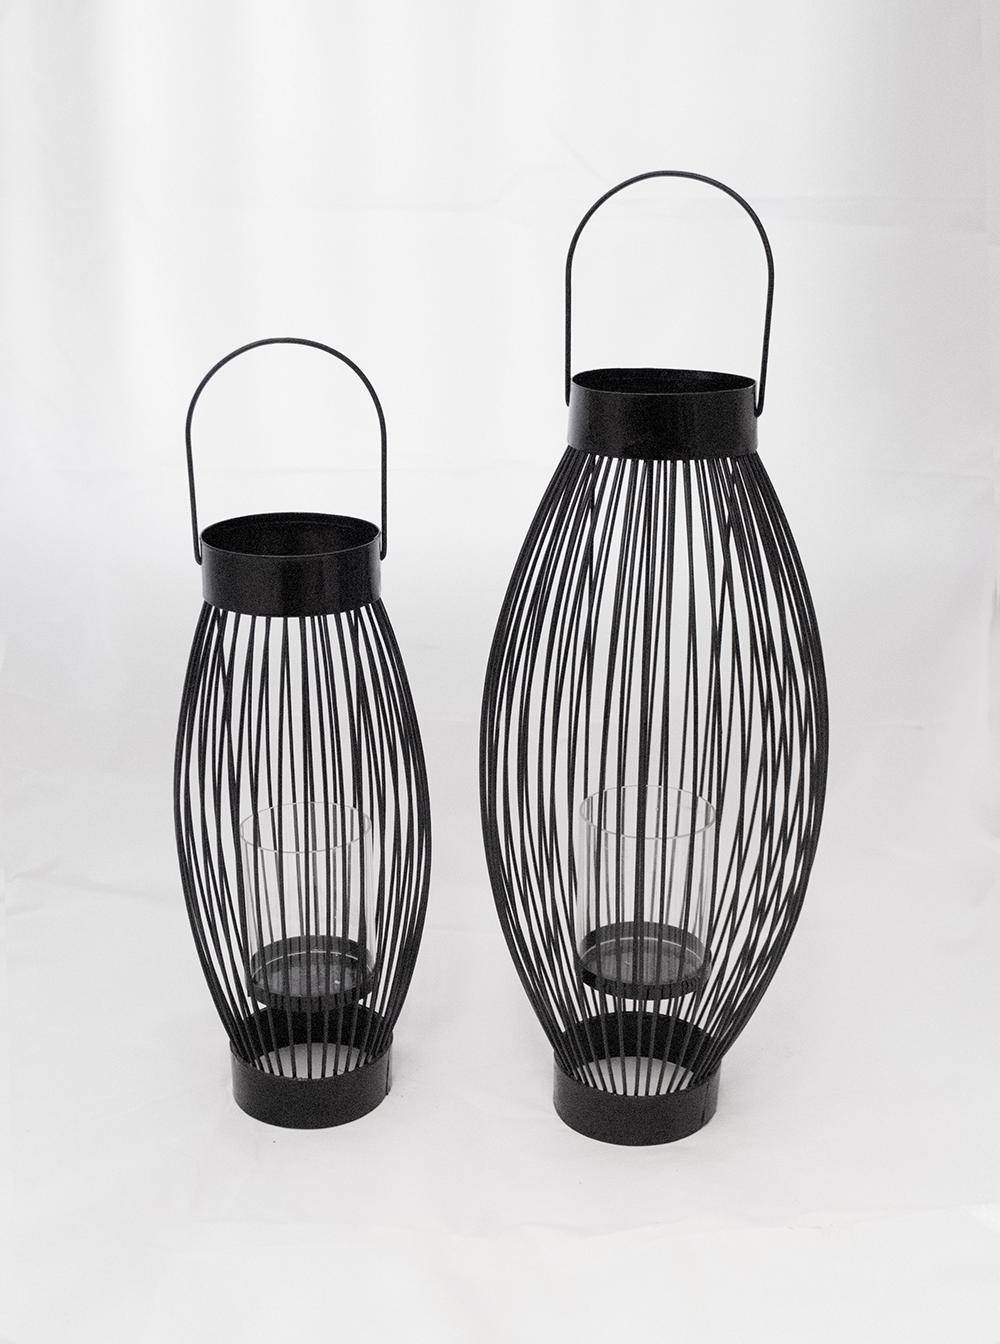 Page Lantern  Black metal + glass cylinder  Quantity: (Short. 3 ) - (tall. 3)  Price: $10.00 - $15.00